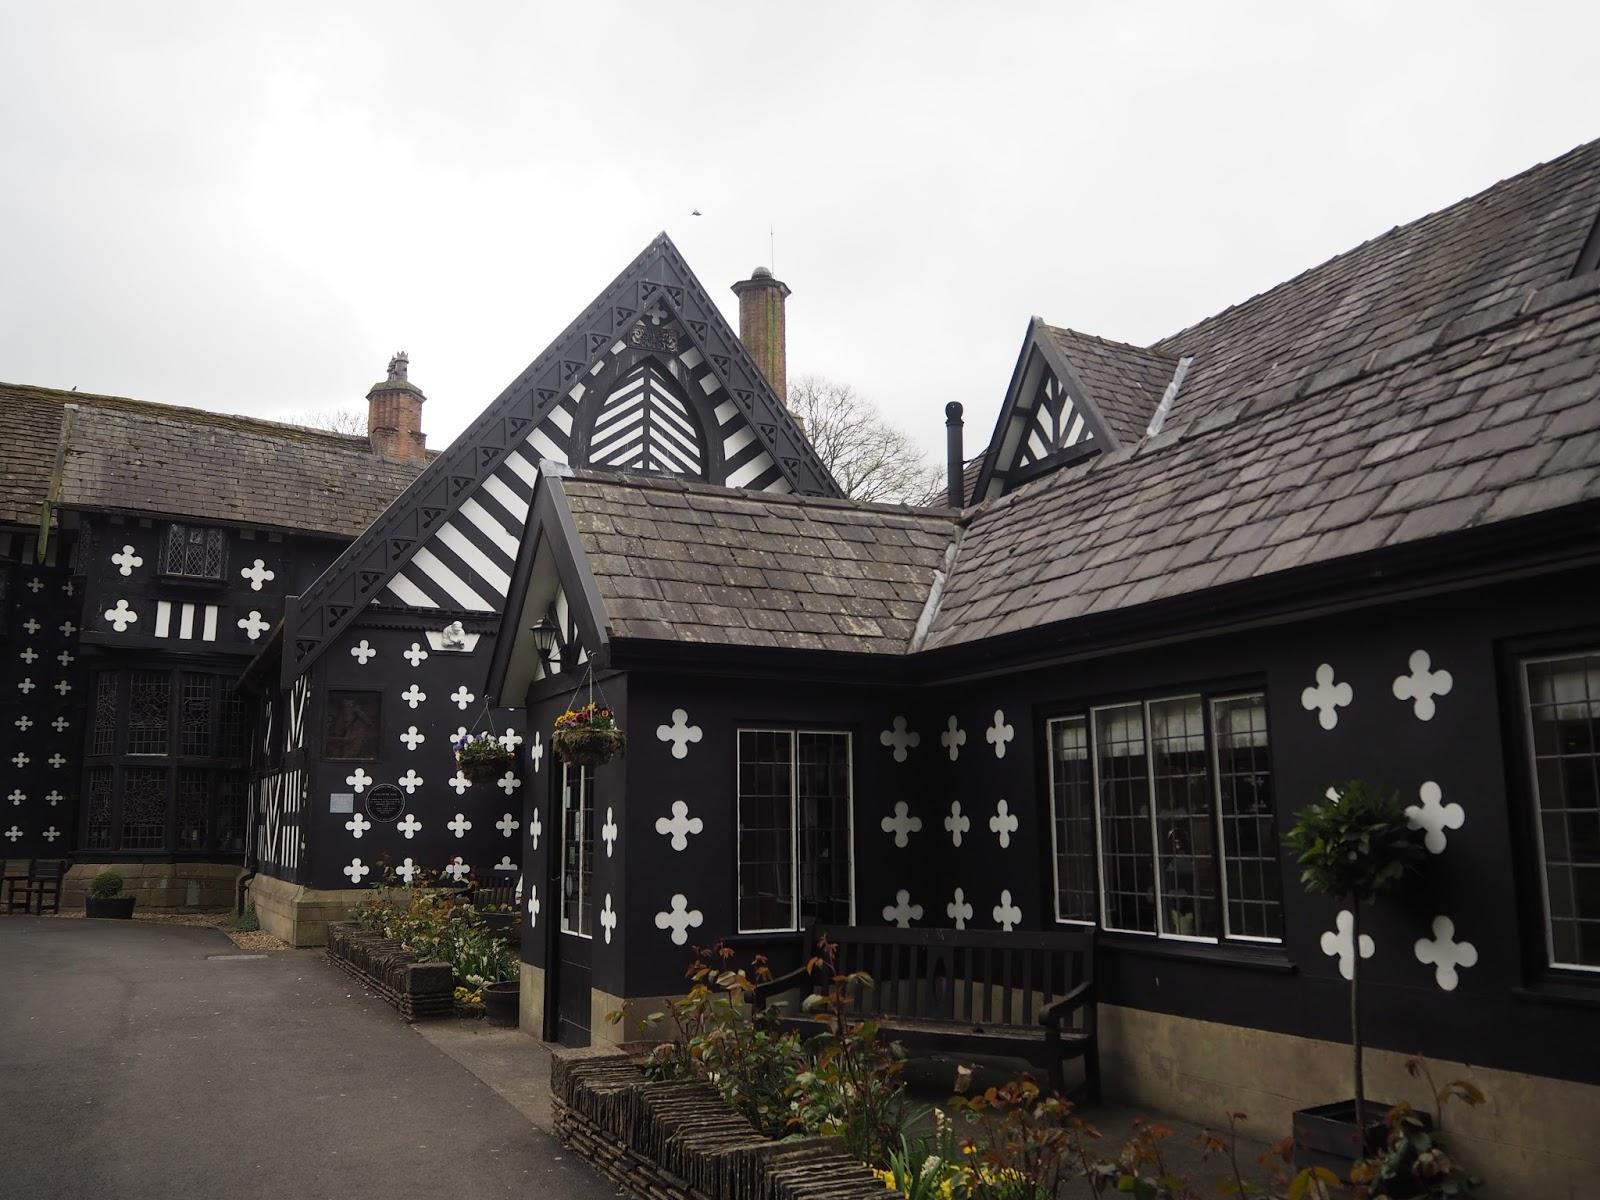 Stirk House Gisburn, Pendle Witch Tours, Samlesbury Hall, external Lancashire